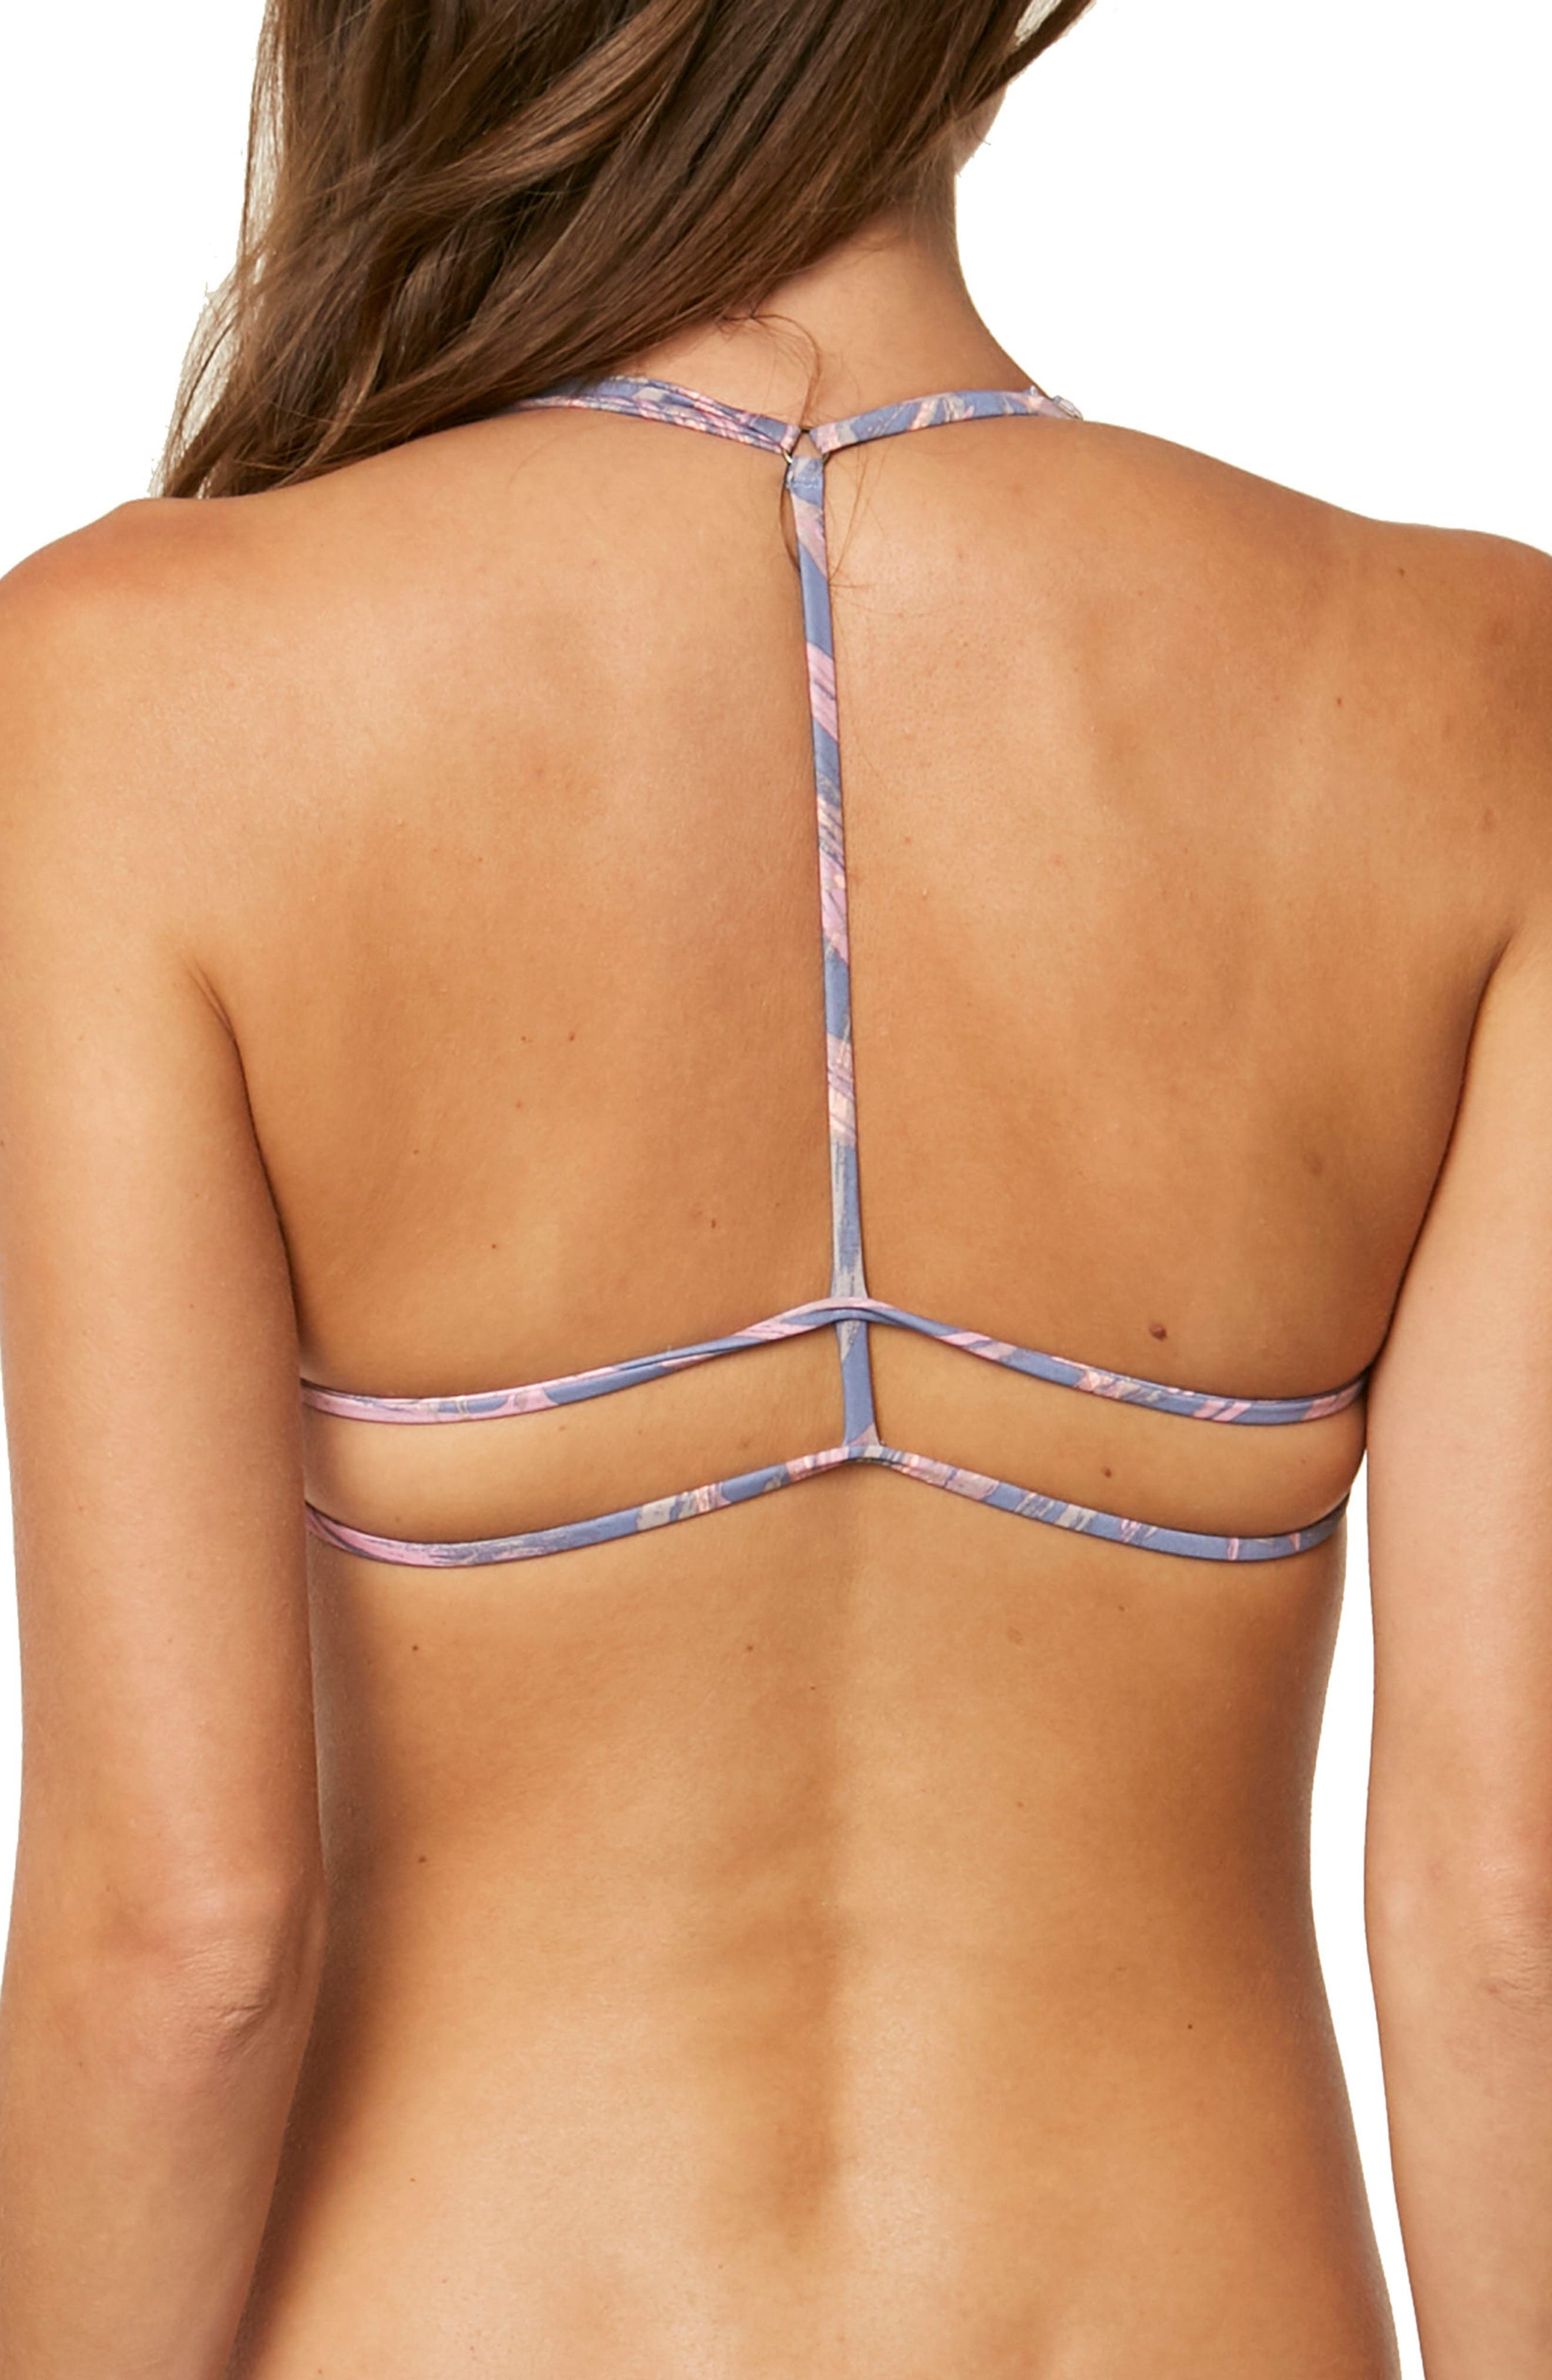 Faye Triangle Bikini Top,                             Alternate thumbnail 2, color,                             Mist - Fog